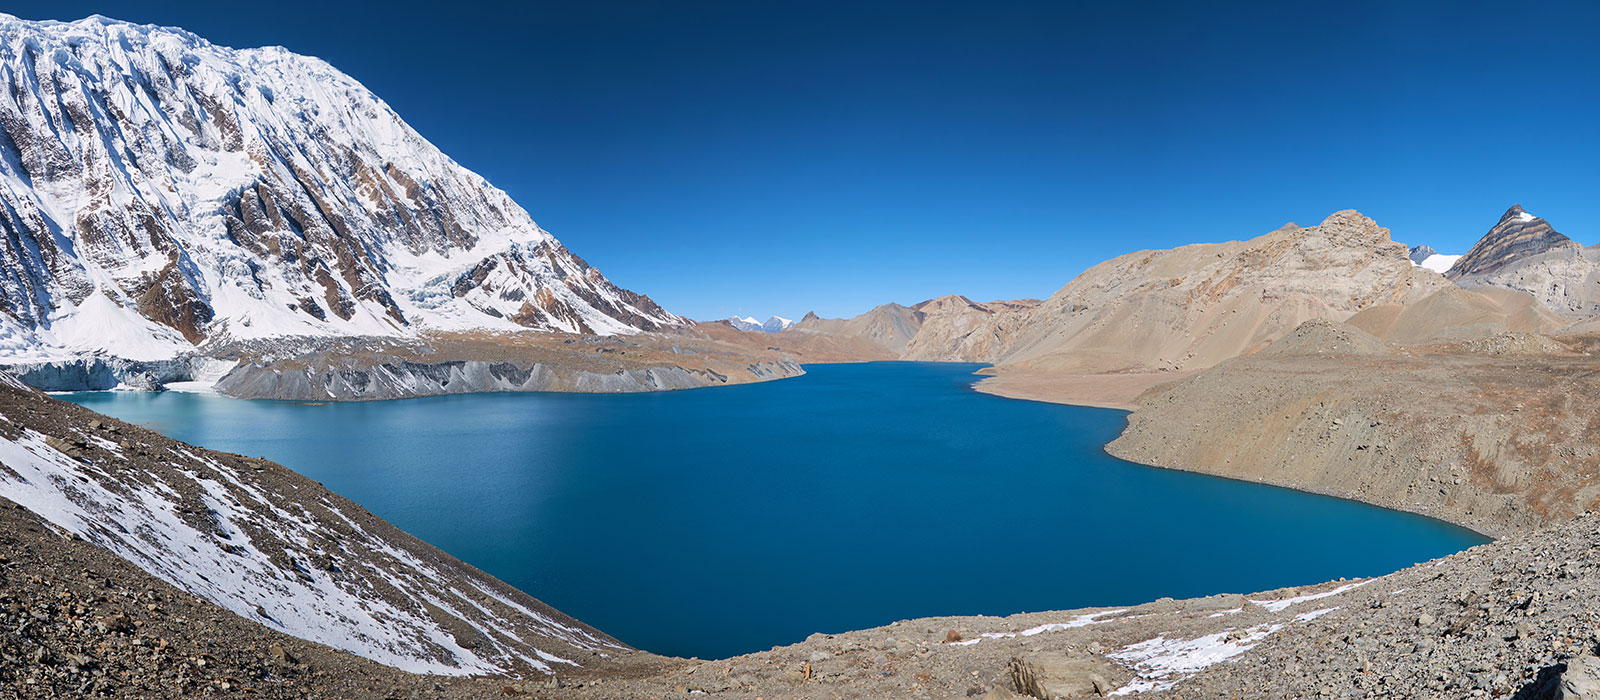 Annapurna Circuit & Tilicho Lake Trek